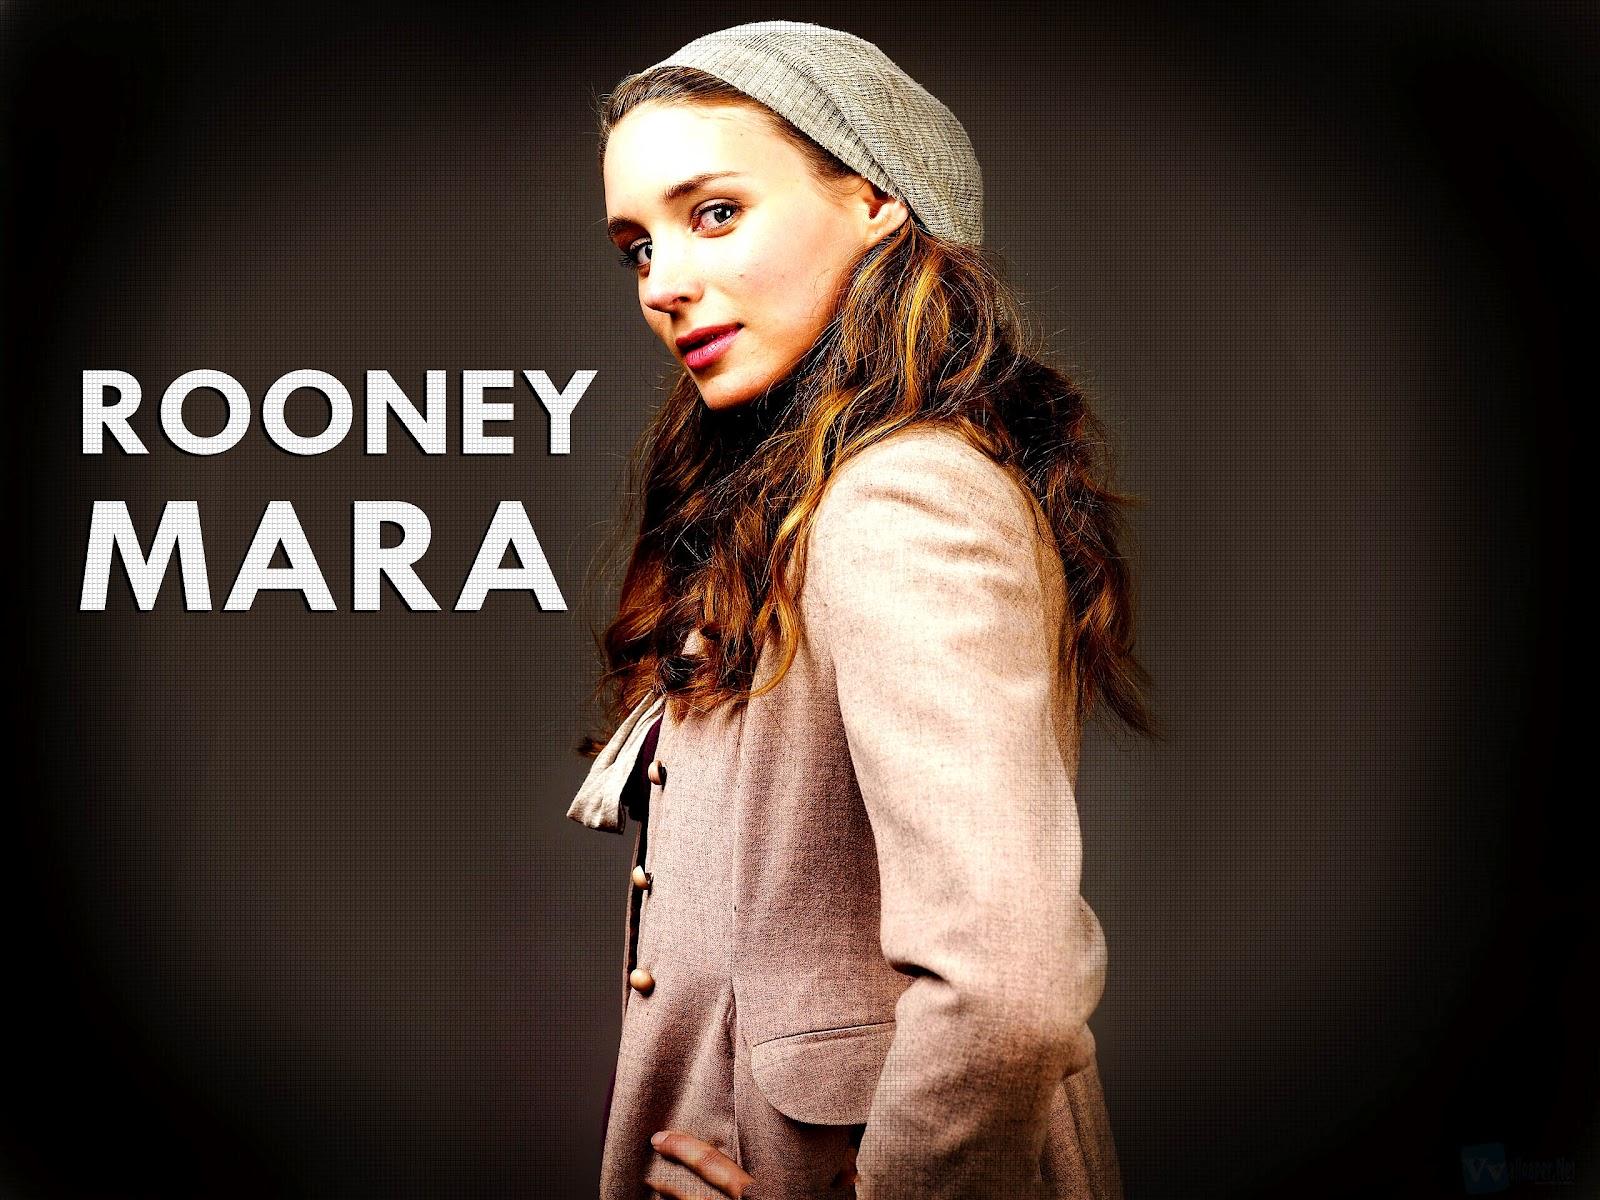 Rooney Mara Wallpaper Hd Rooney Mara Hot Hd Wallpapers High Resolution Pictures